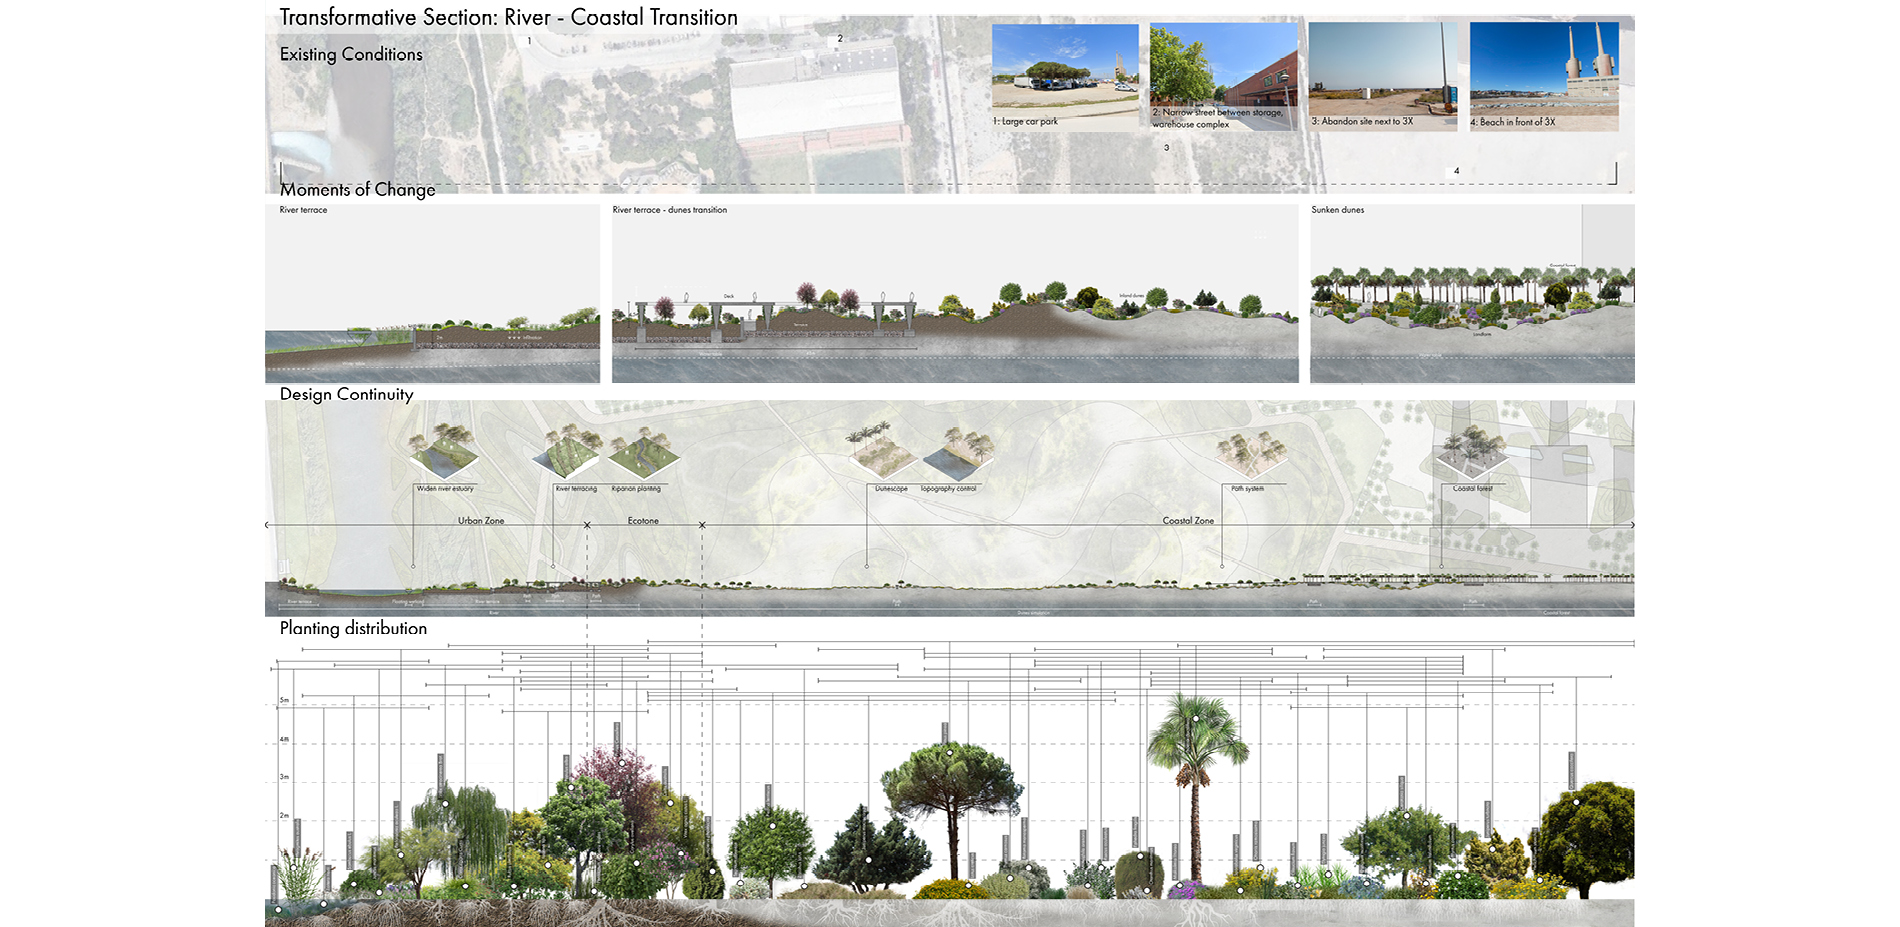 Transformative Section: River - Coastal Transition